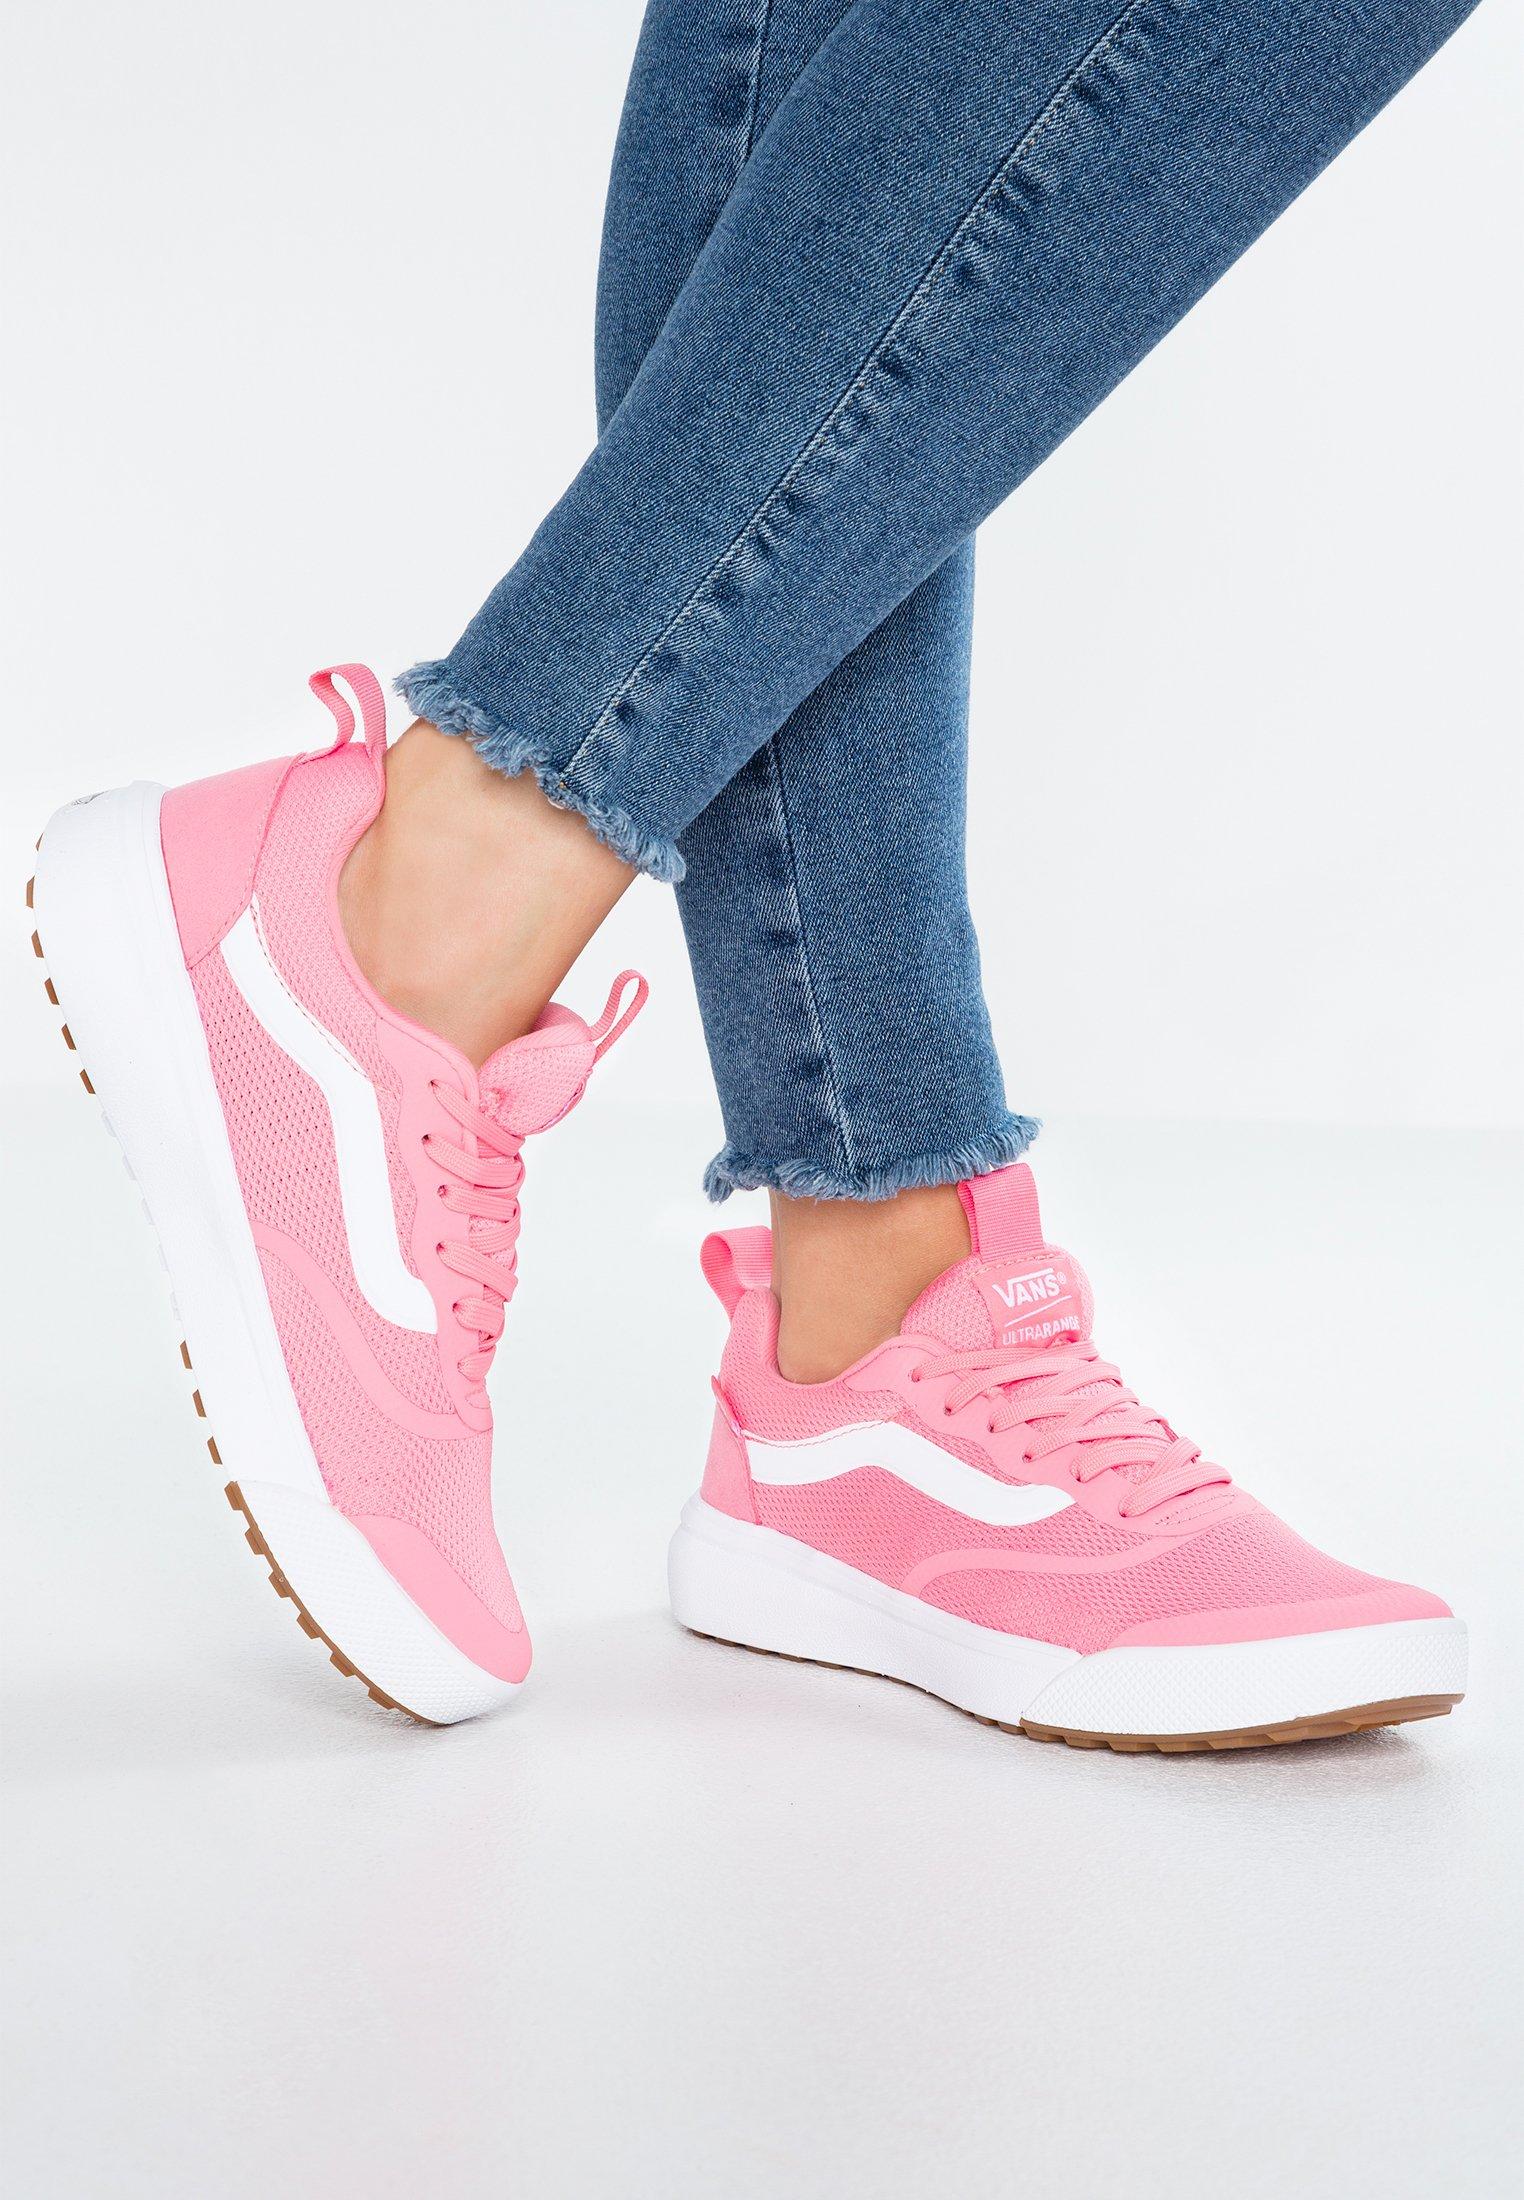 Vans Basses Ultrarange RapidweldBaskets Pink Strawberry sdCQrtBhx